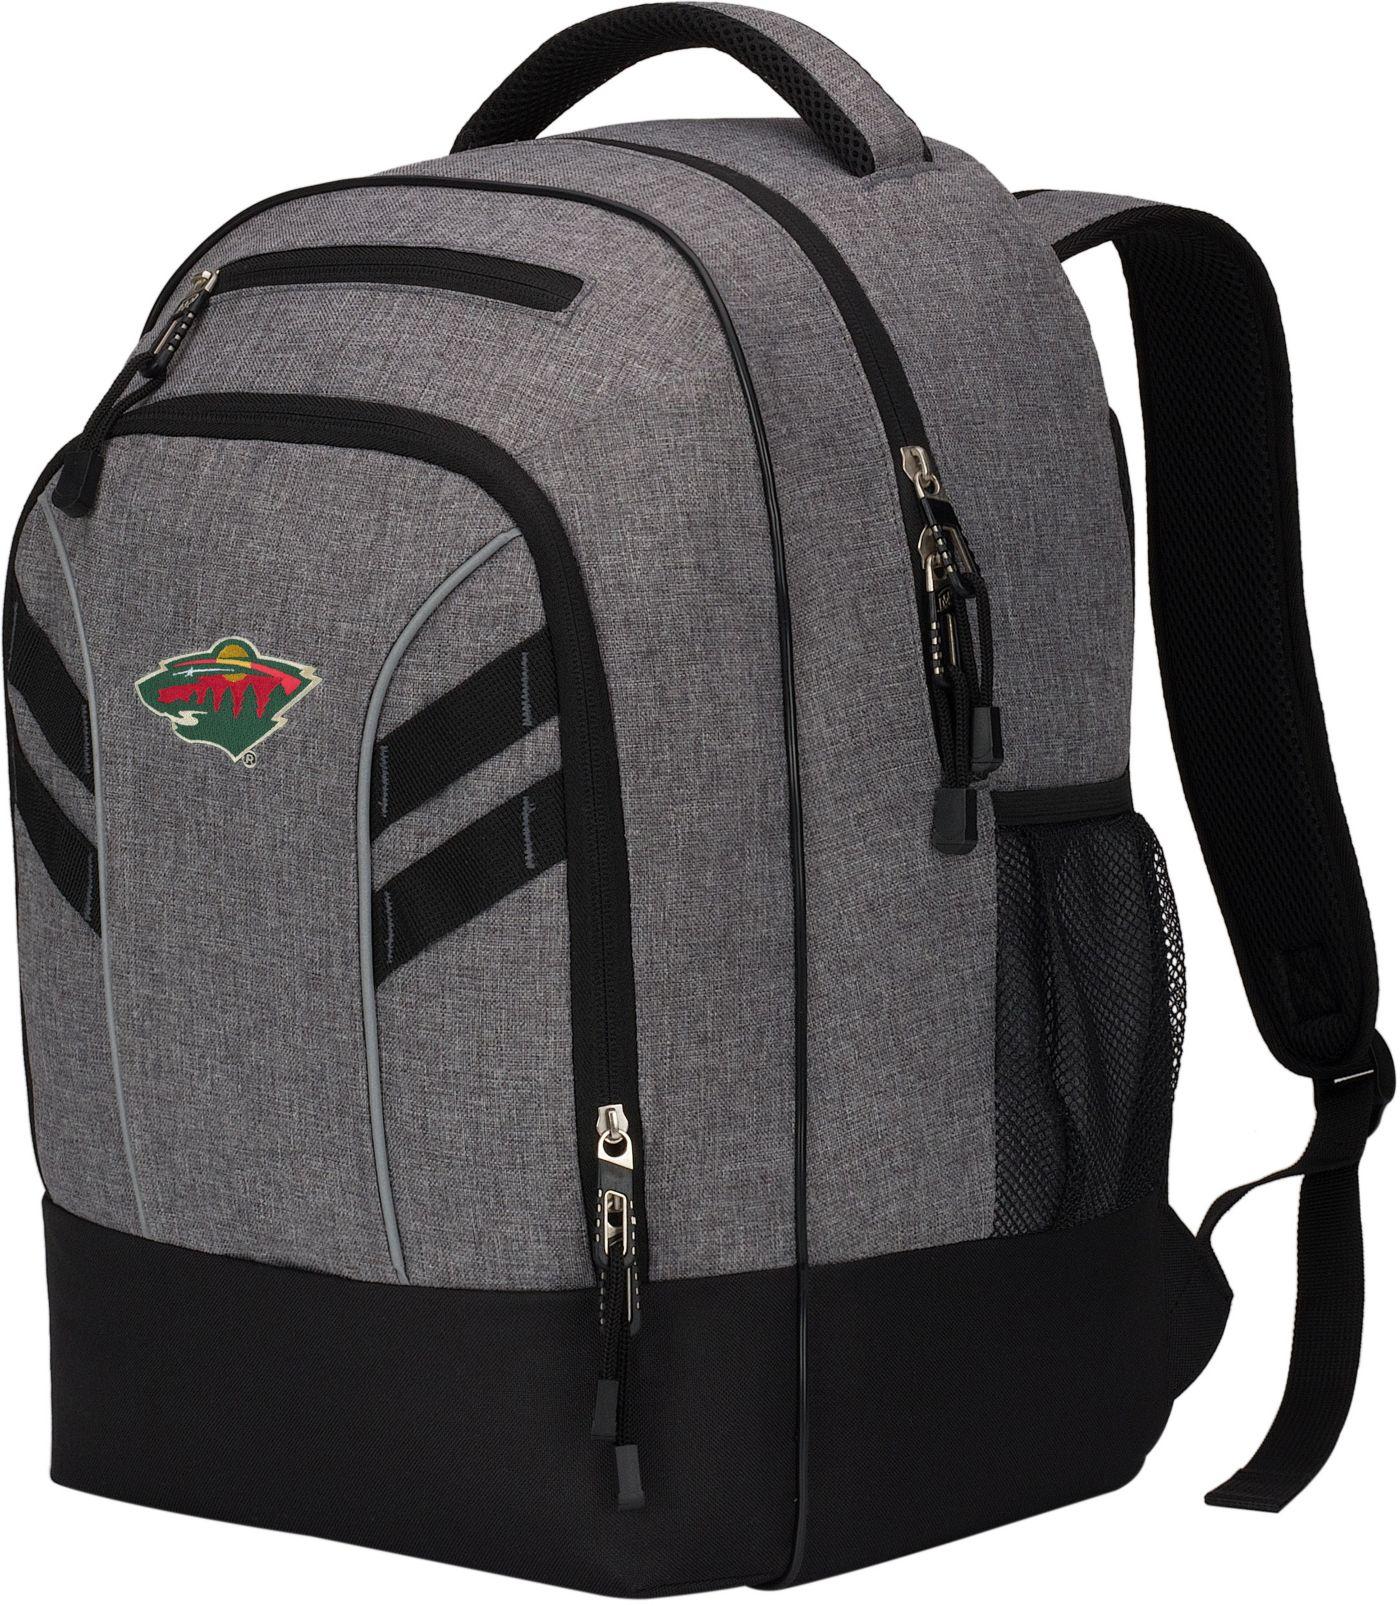 Northwest Minnesota Wild Razor Backpack